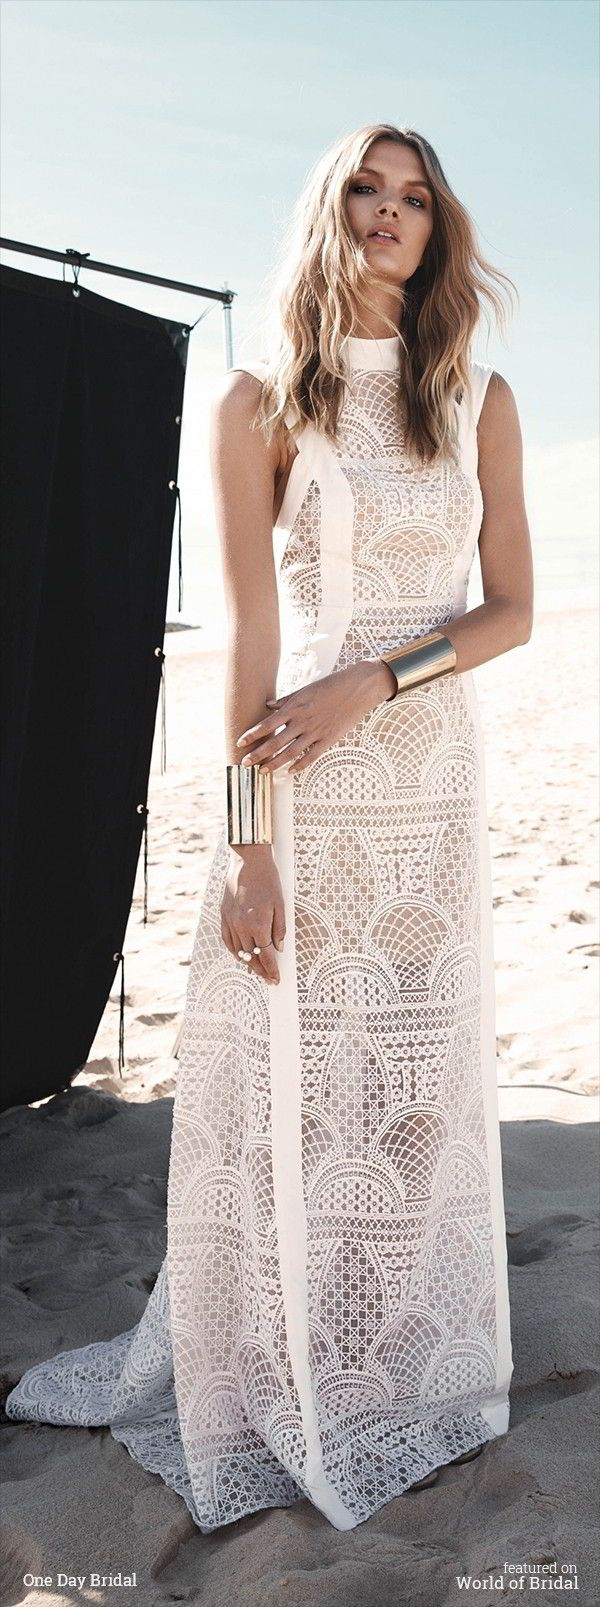 edgy wedding dresses gorgeous wedding dresses 25 Best Ideas about Edgy Wedding Dresses on Pinterest Amazing wedding dress Sexy wedding shoes and Big dresses